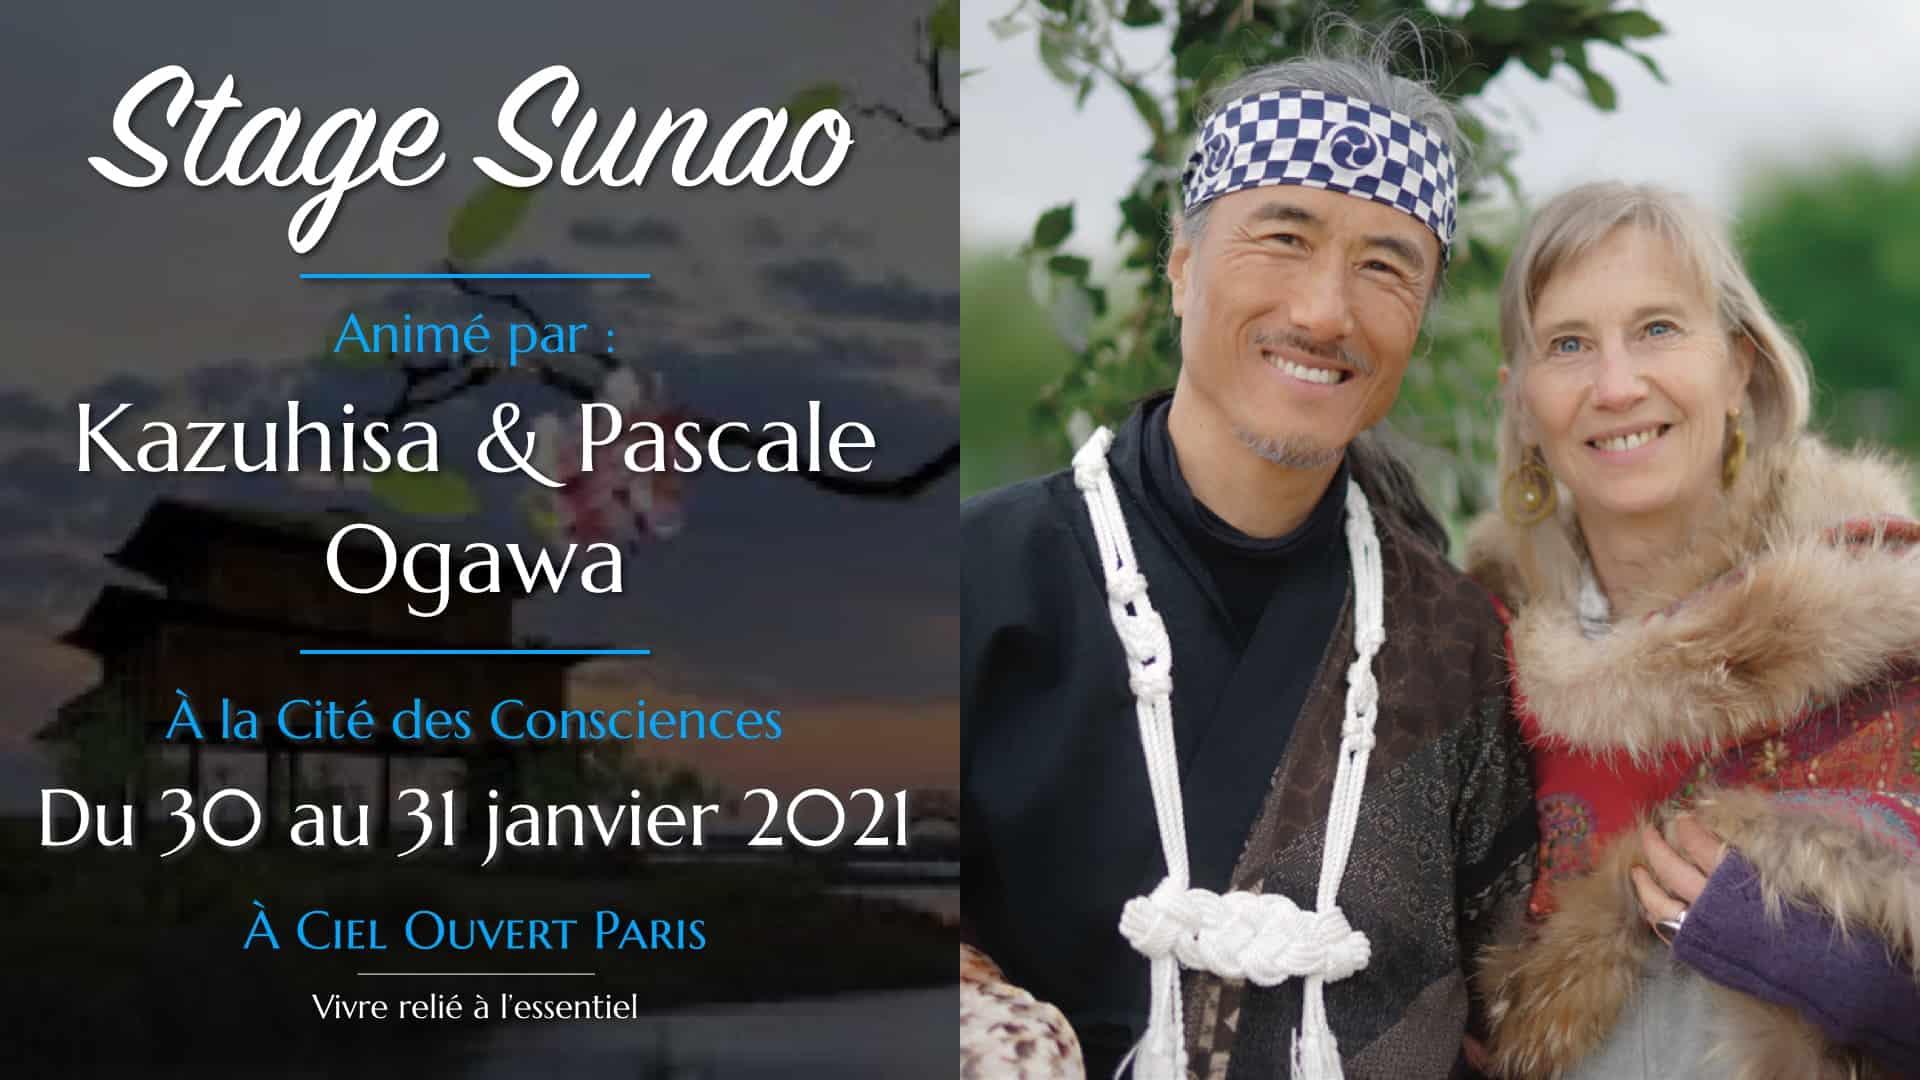 Stage Sunao – Un chemin vers votre véritable guérison – Kazuhisa & Pascale Ogawa